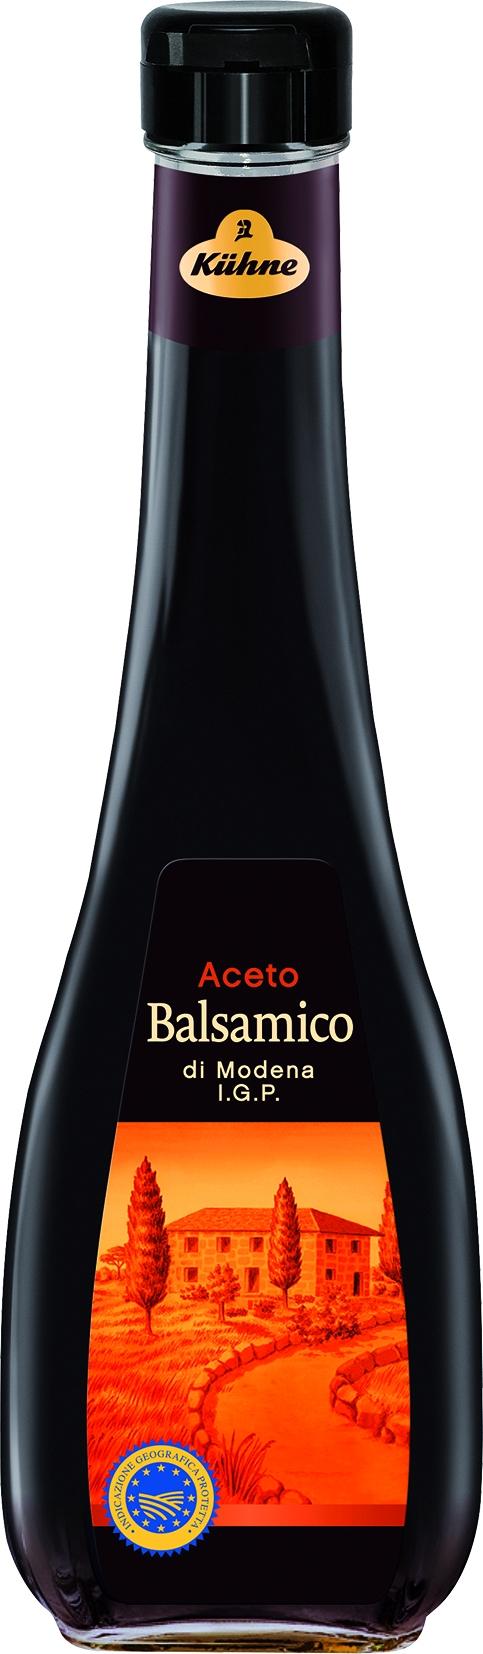 Exquisit Essig Balsamico